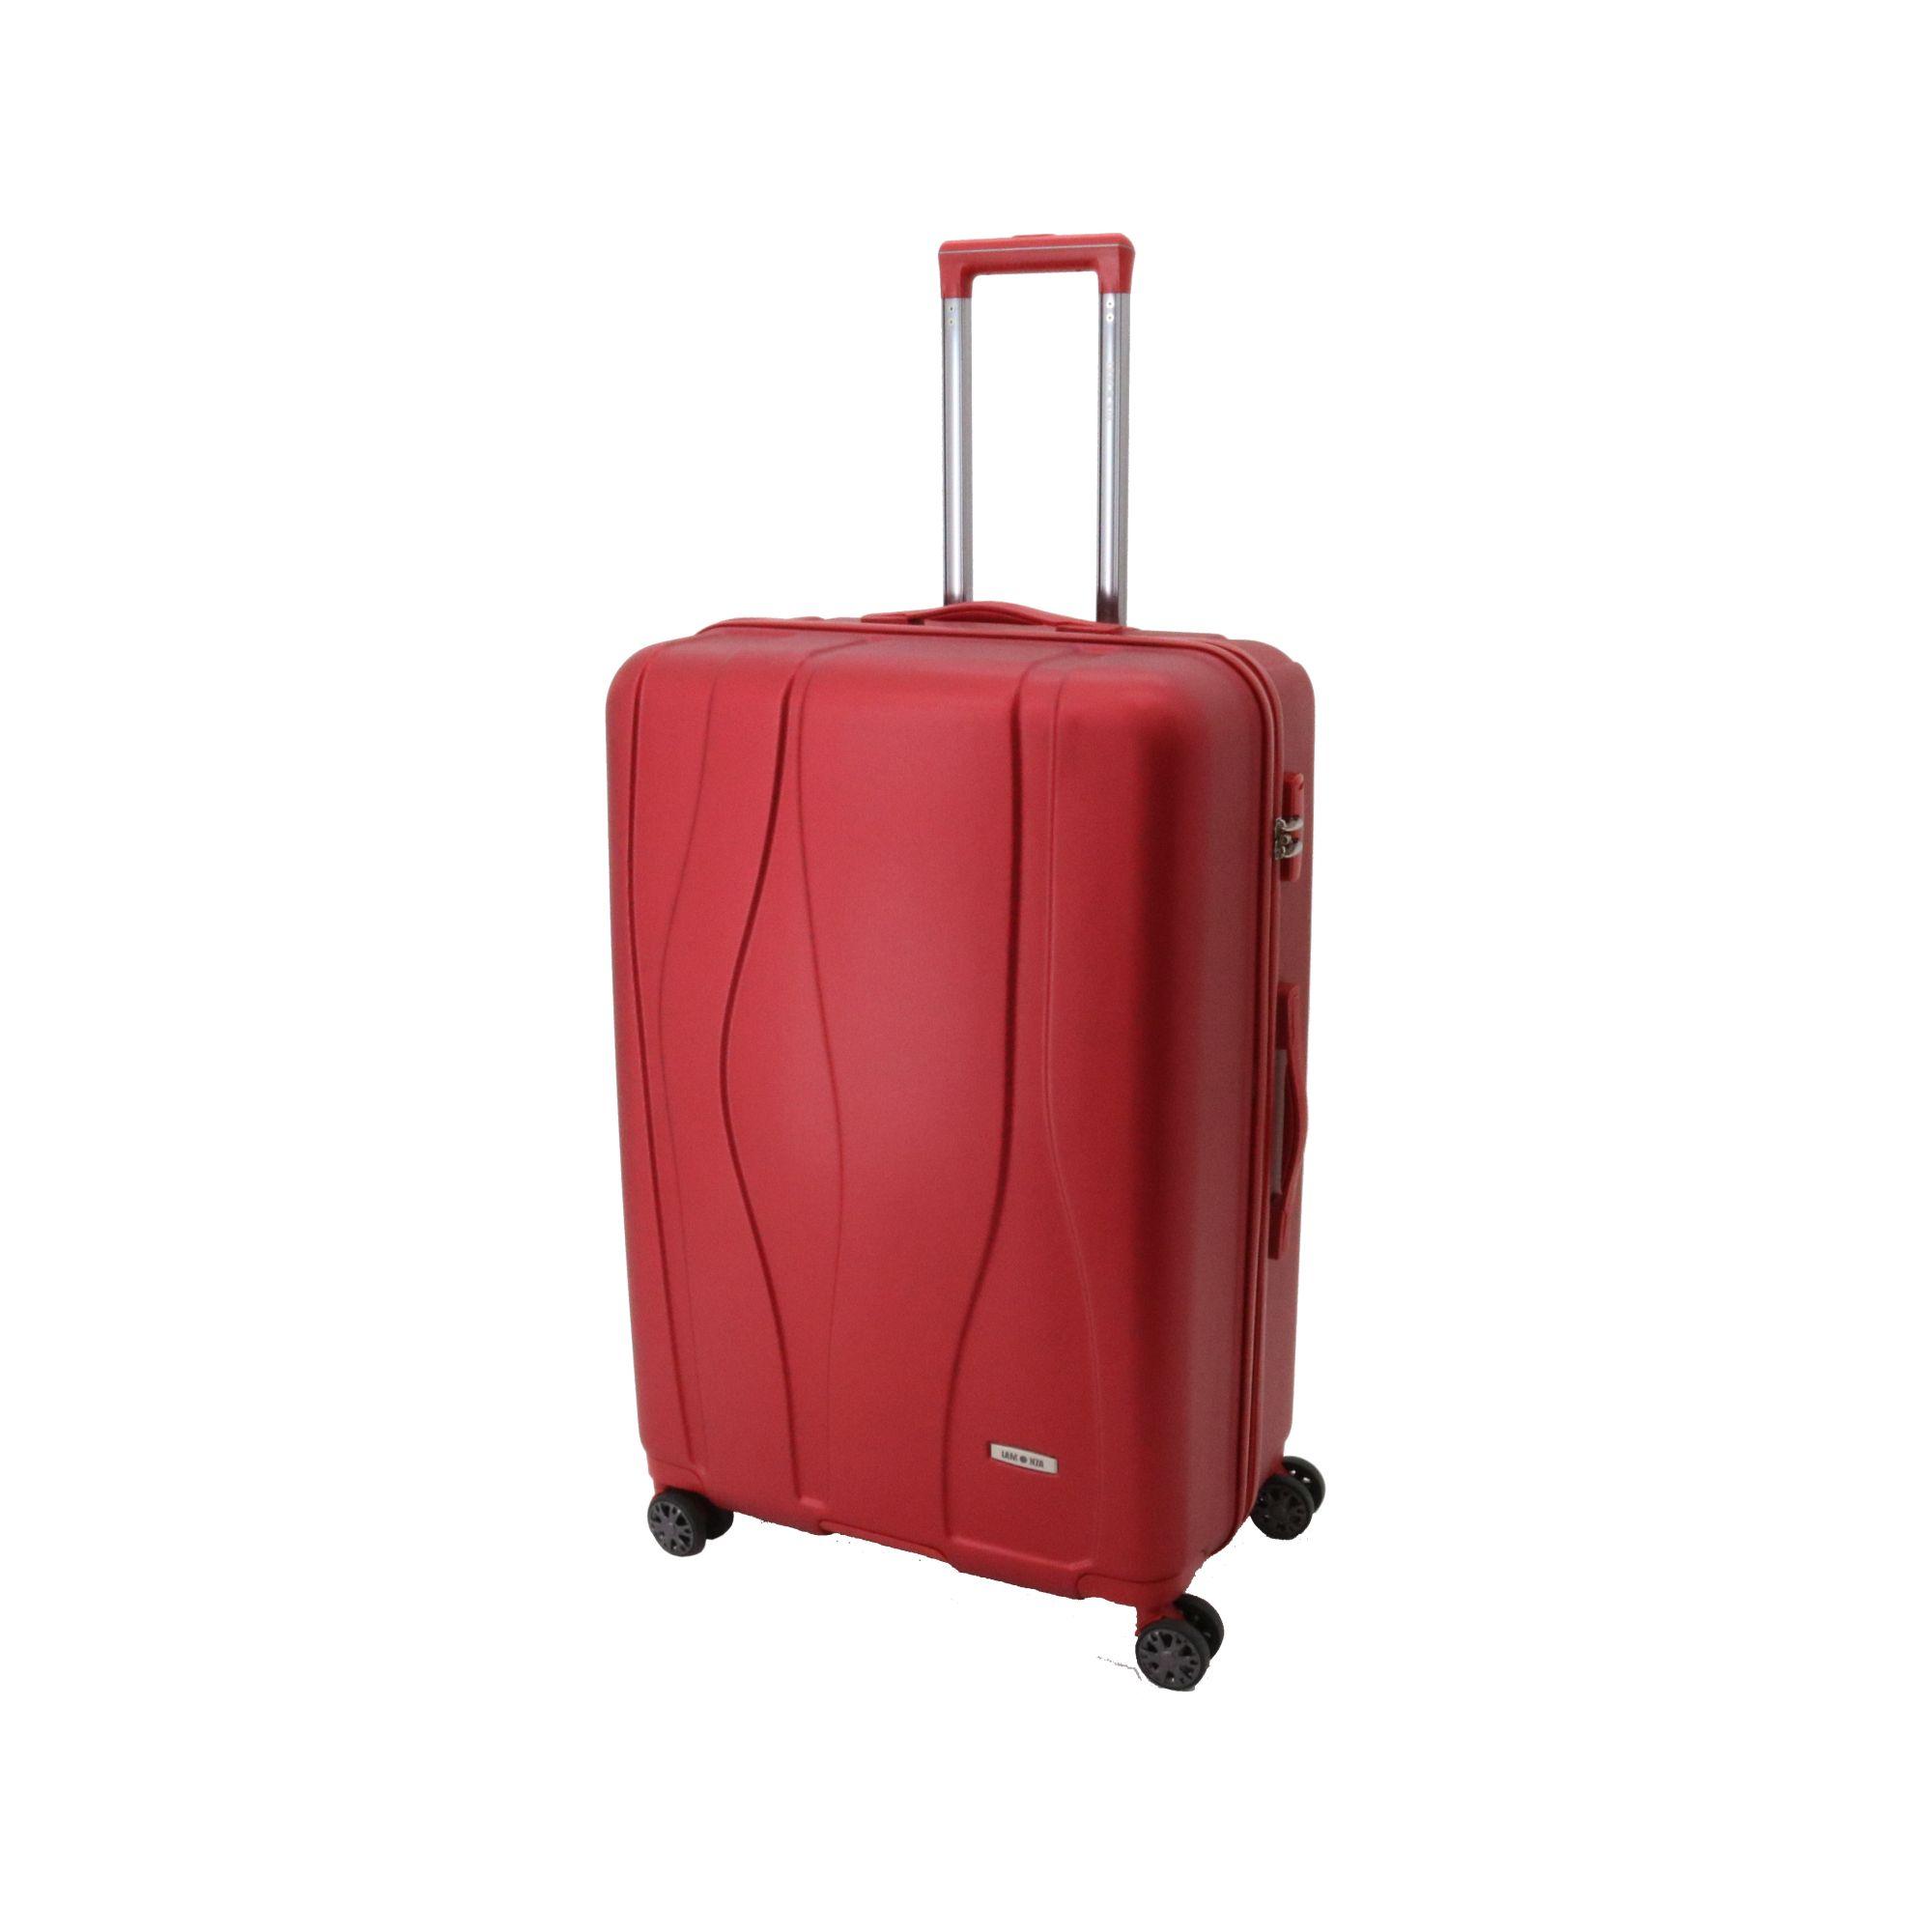 Troler Civic 68x45x25 cm, 3.10 kg, rosu